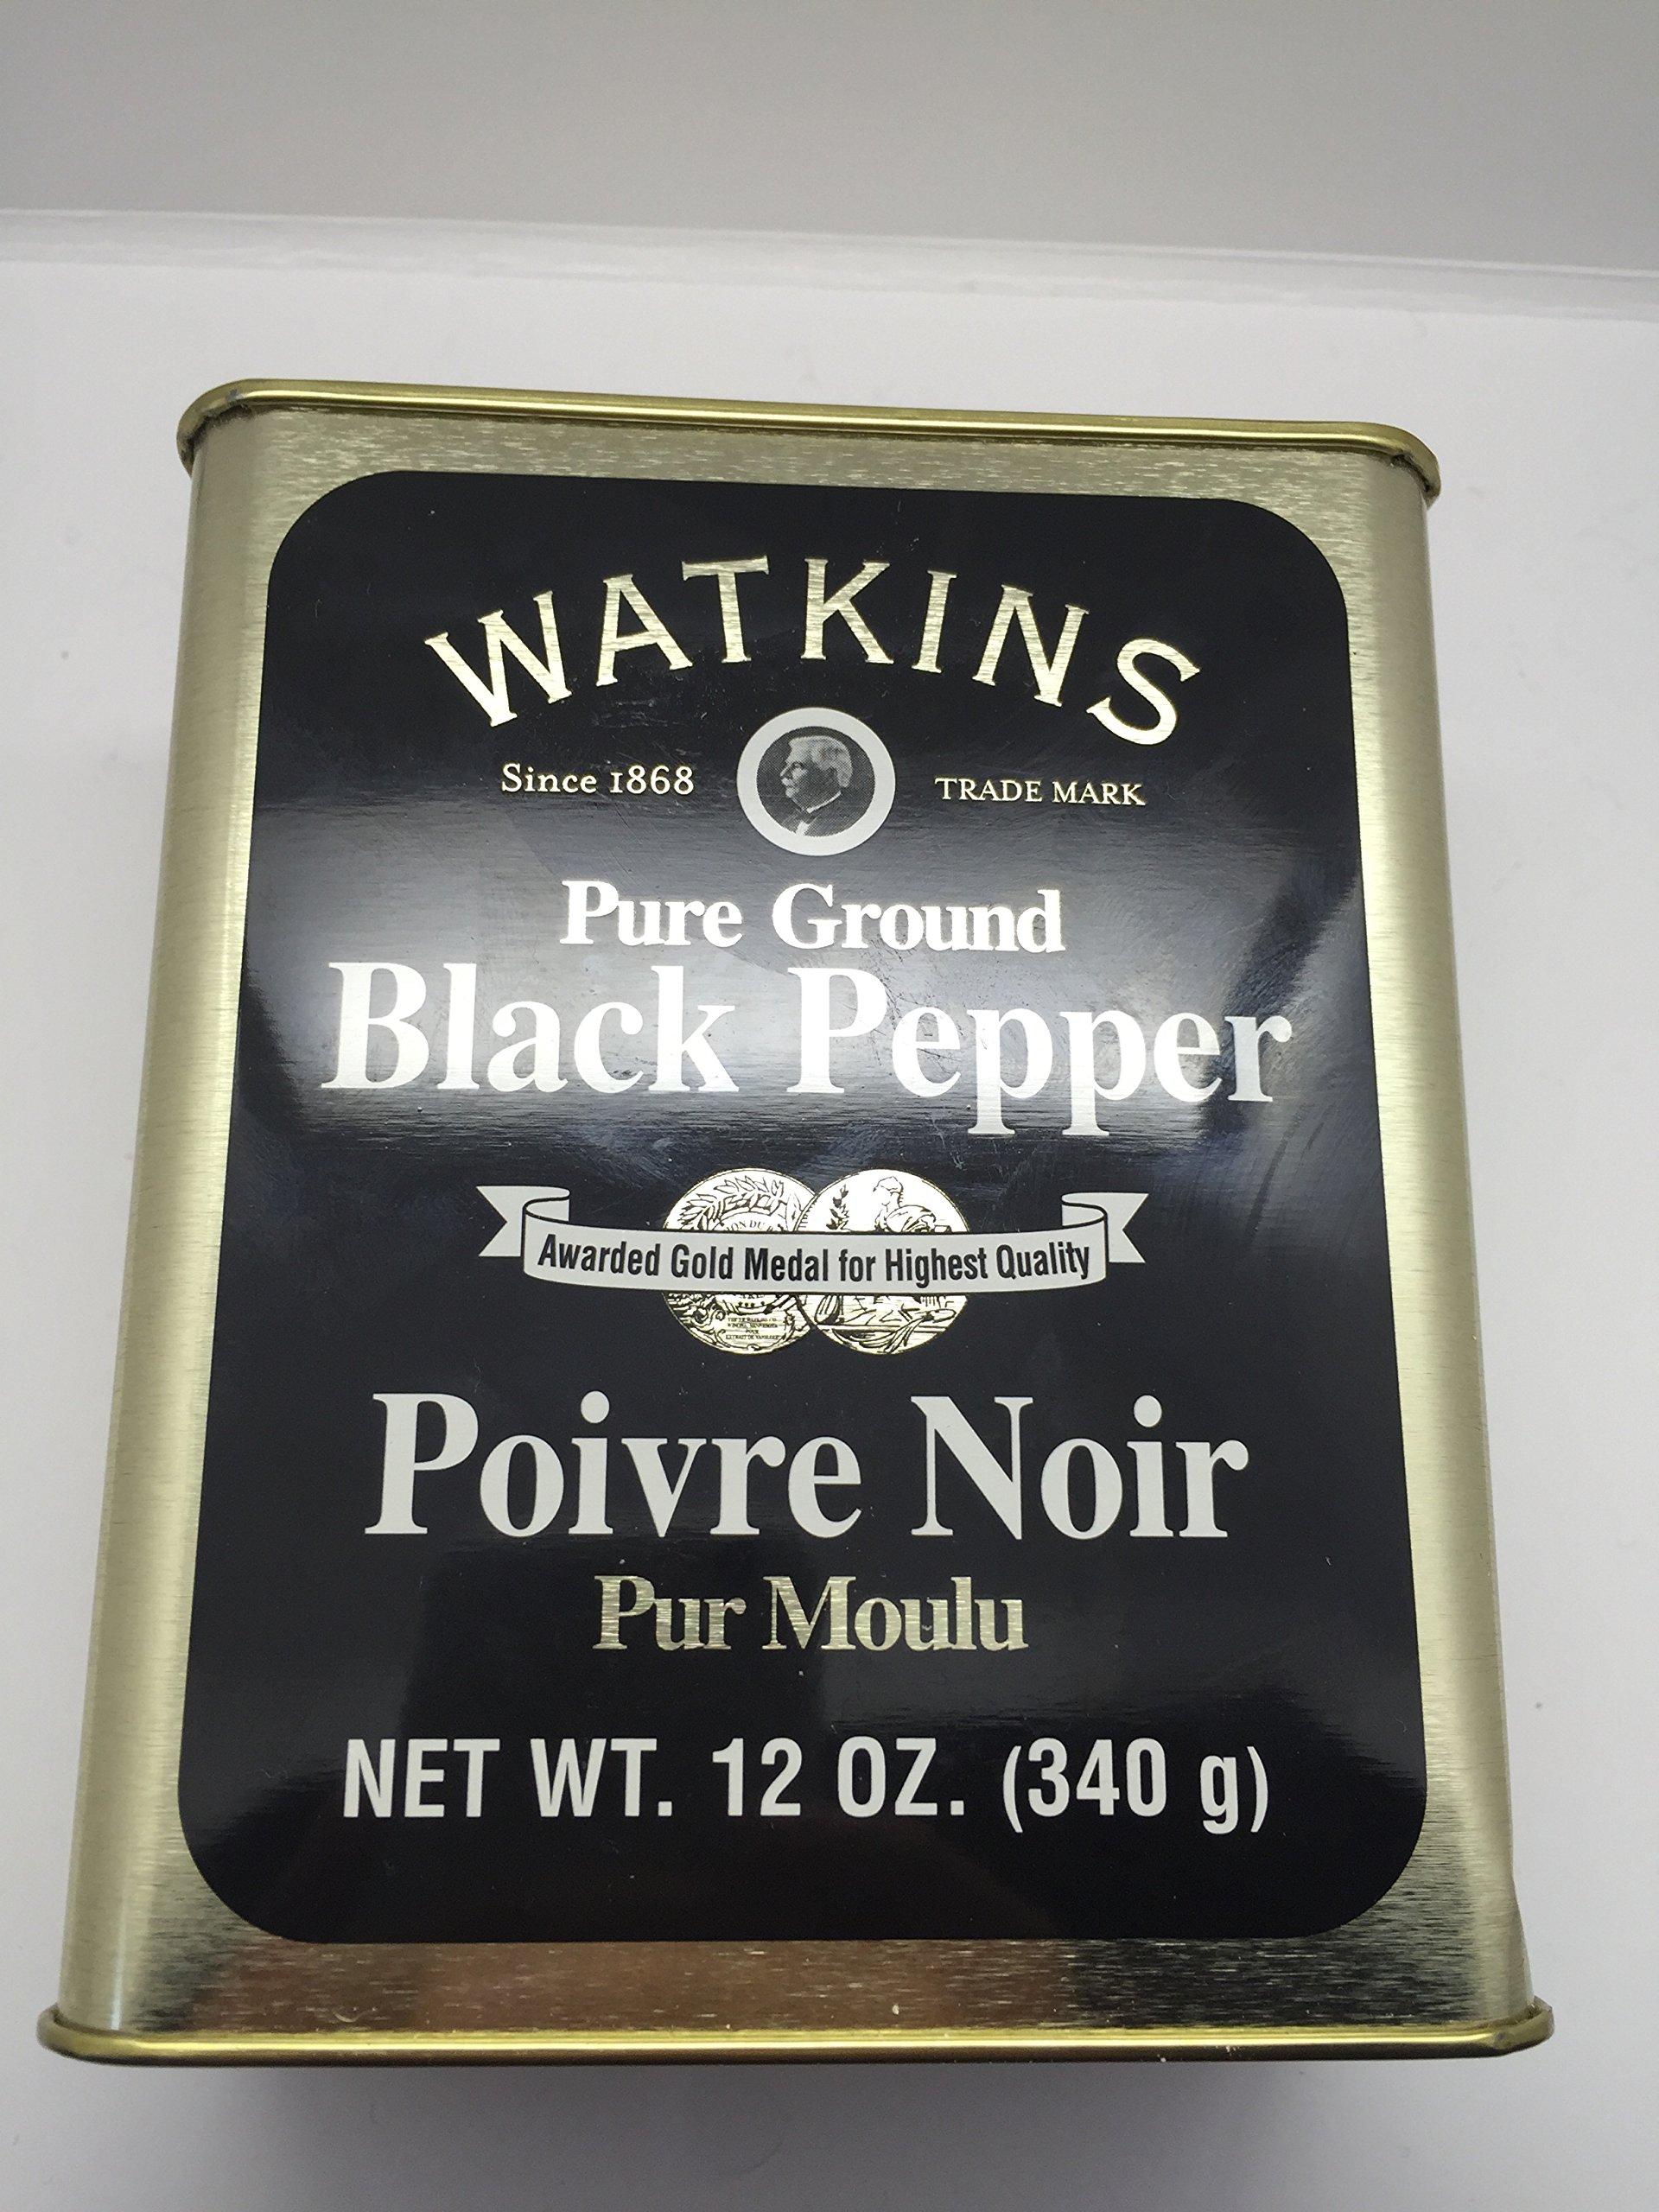 JR Watkins Purest Black Pepper 12oz.